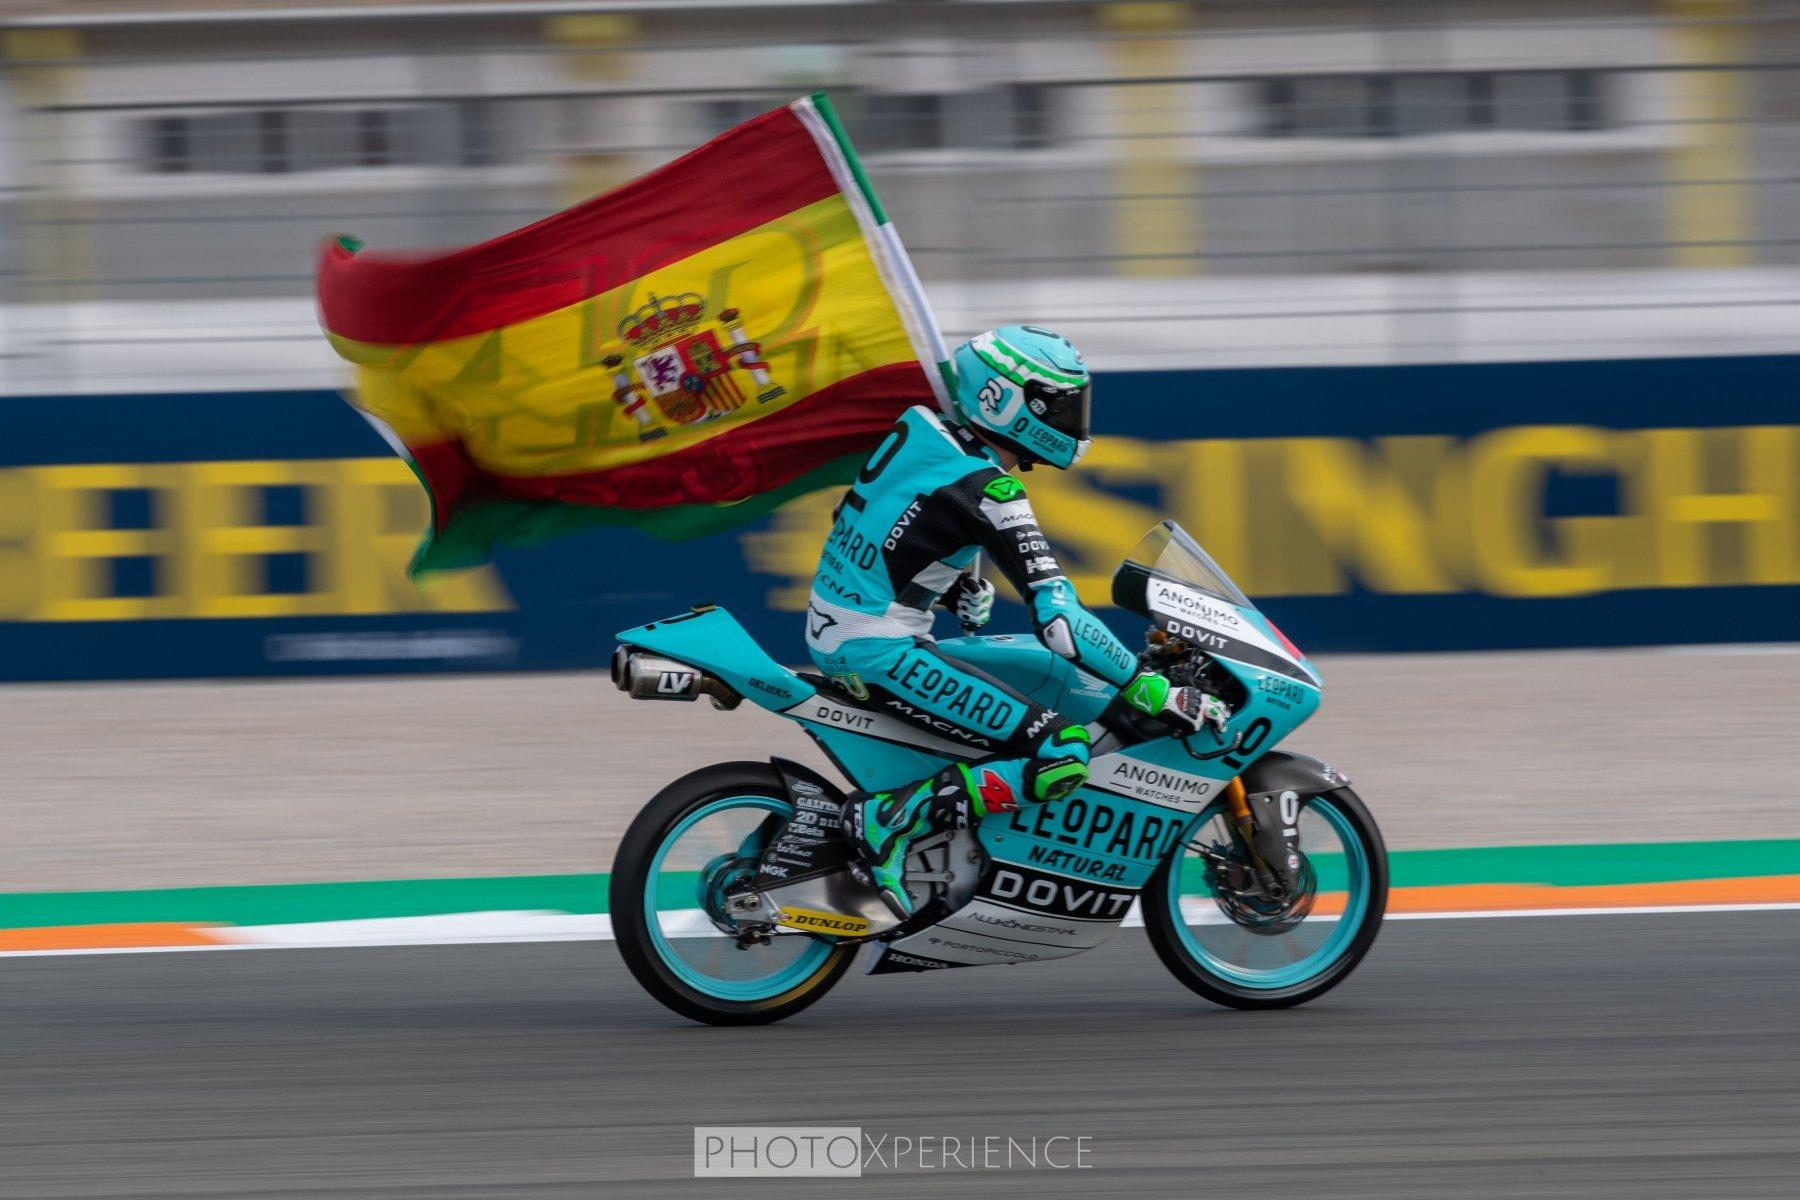 Celebracion-españa-motogp